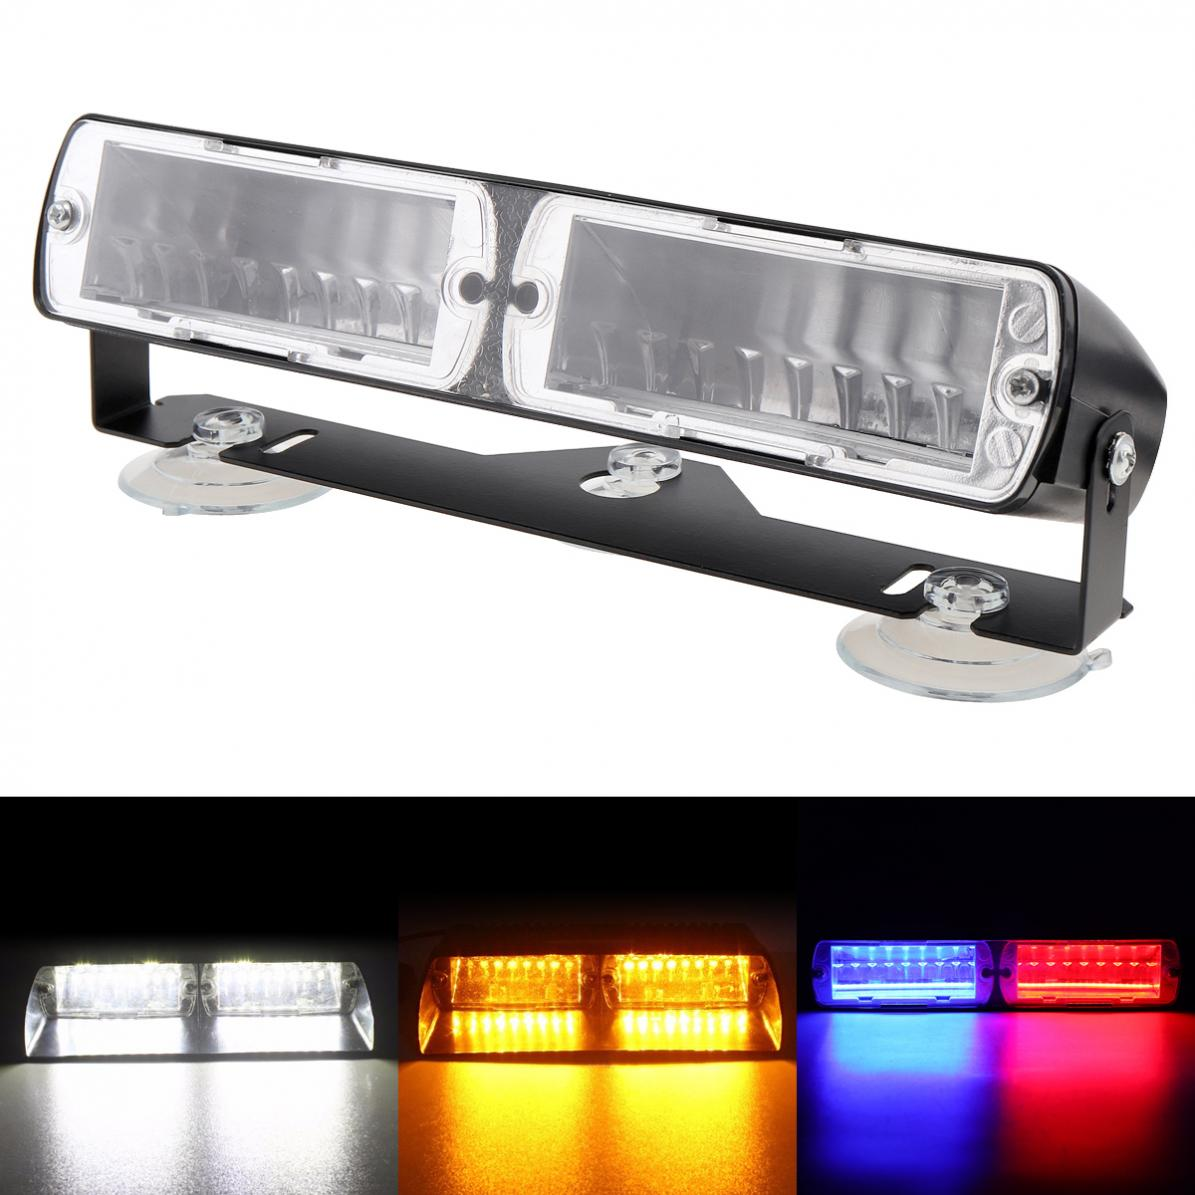 16LED 48W Viper S2 Super Bright Signal Flashing Led Warning Light Police Strobe Flash Emergency Lights